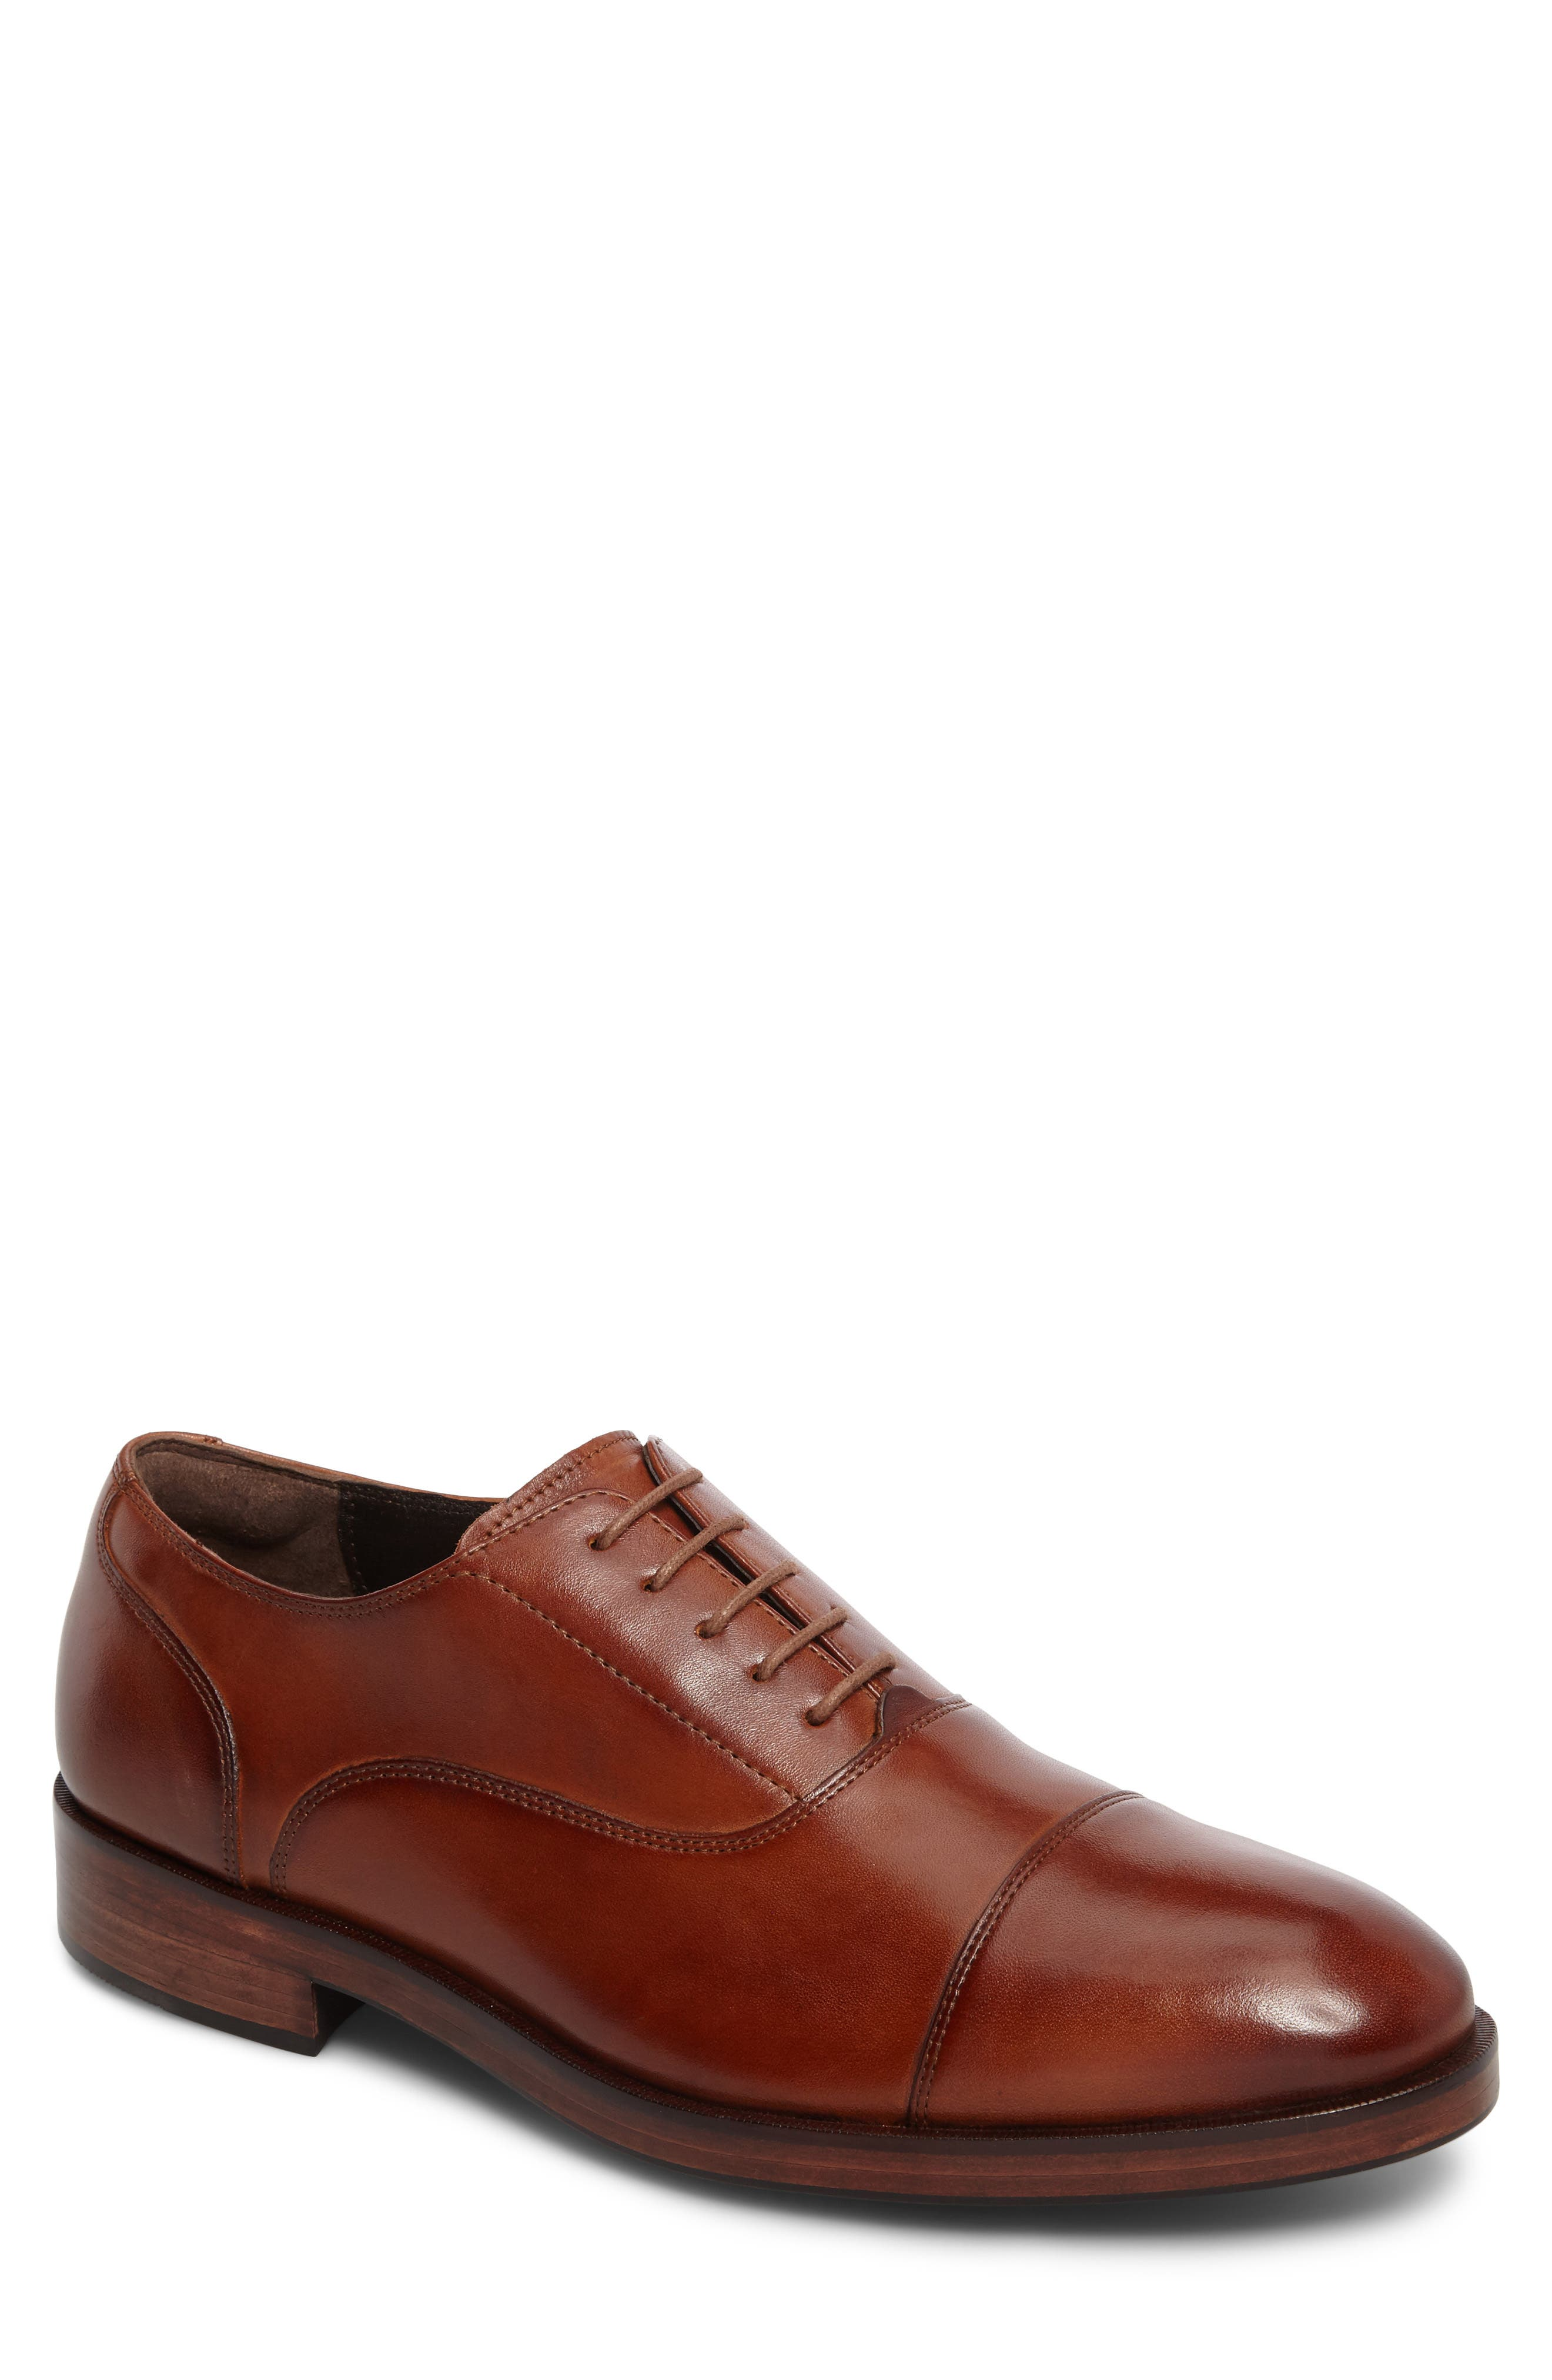 Harrison Grand Cap Toe Oxford,                             Main thumbnail 1, color,                             British Tan Leather